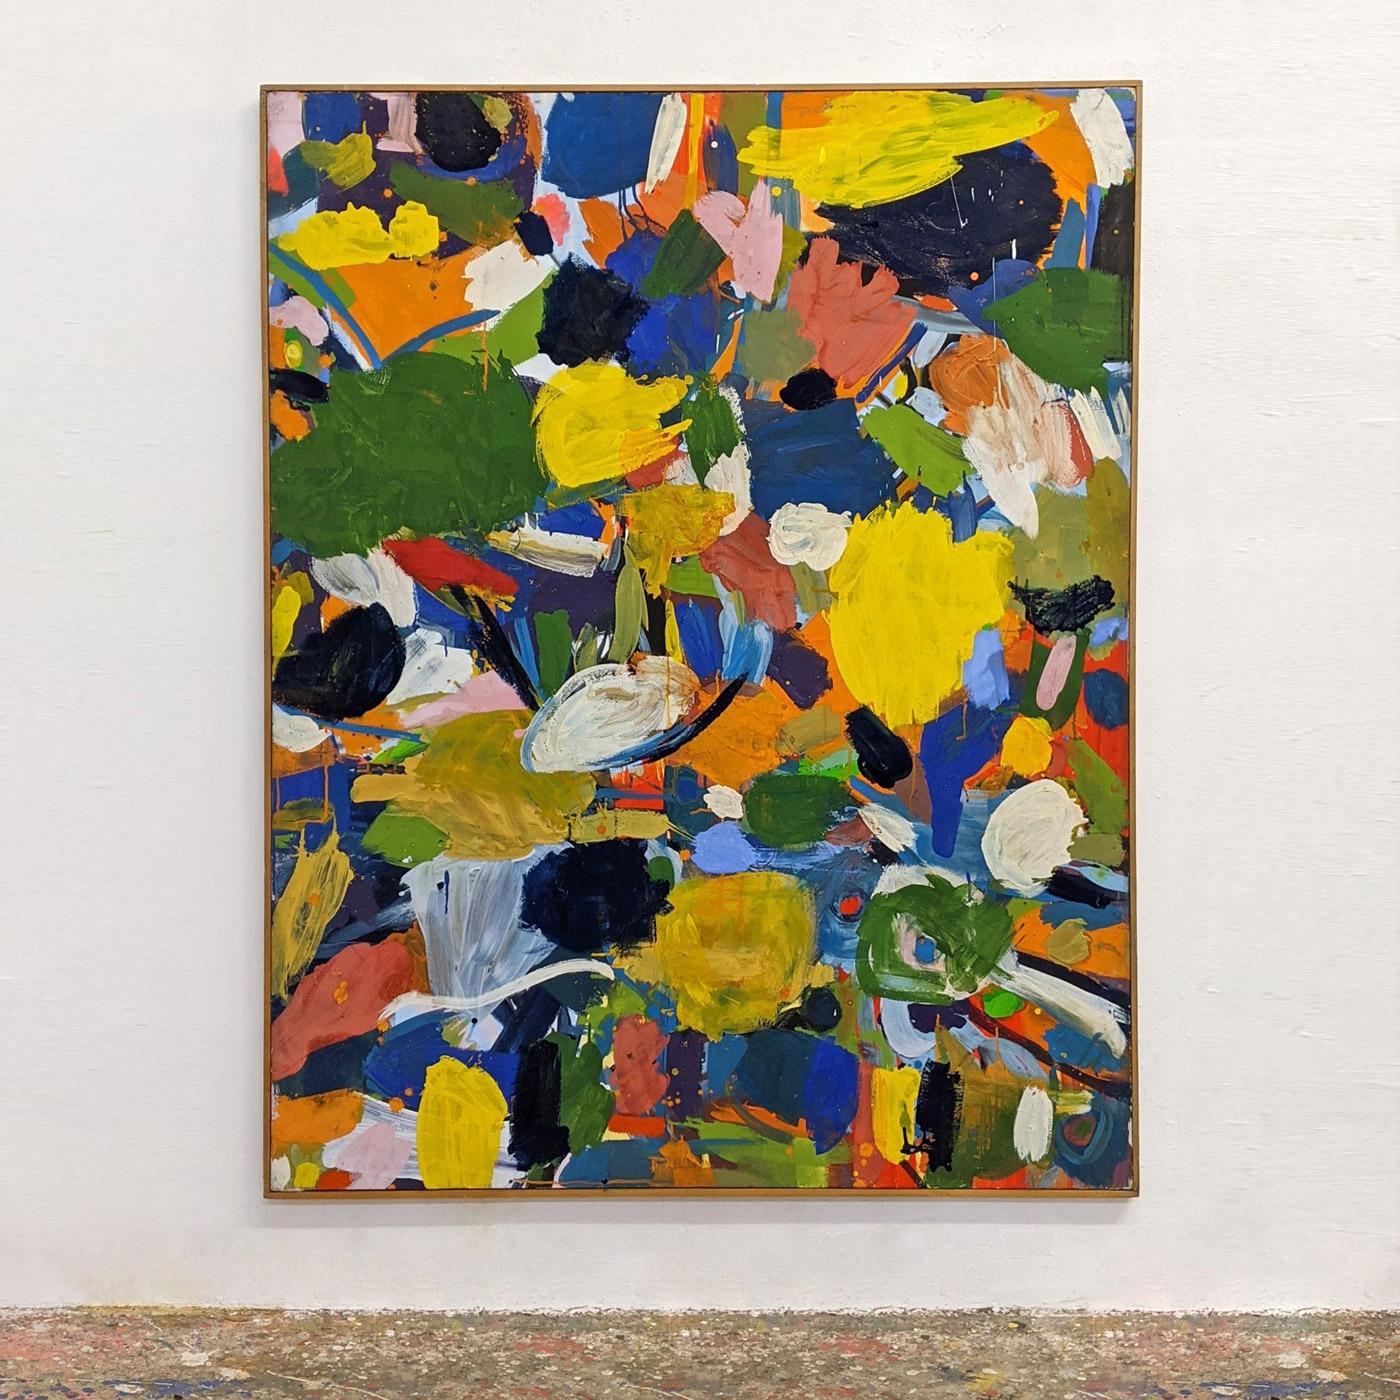 """Spätherbst"", 156 x 123 cm, Acrylbinder, Farbpigmente, Nessel, 1984"